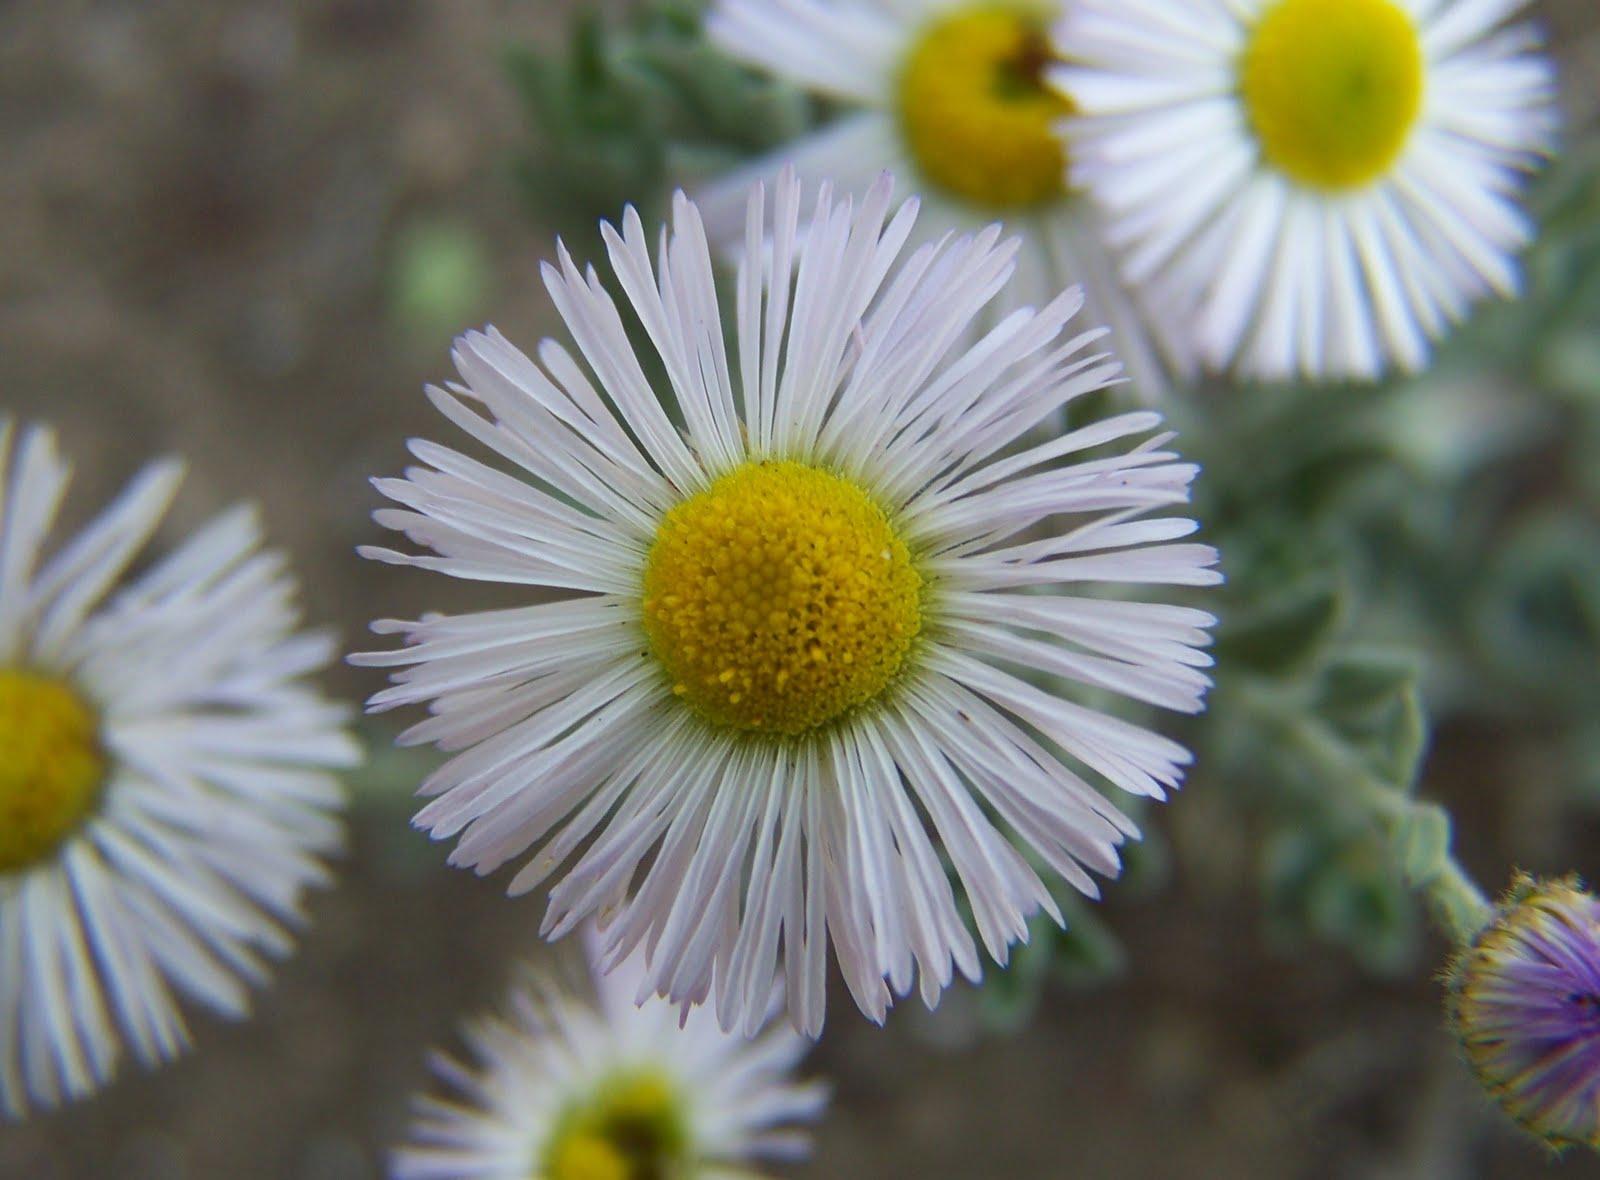 Gardening and Flowers: White Daisy Flower